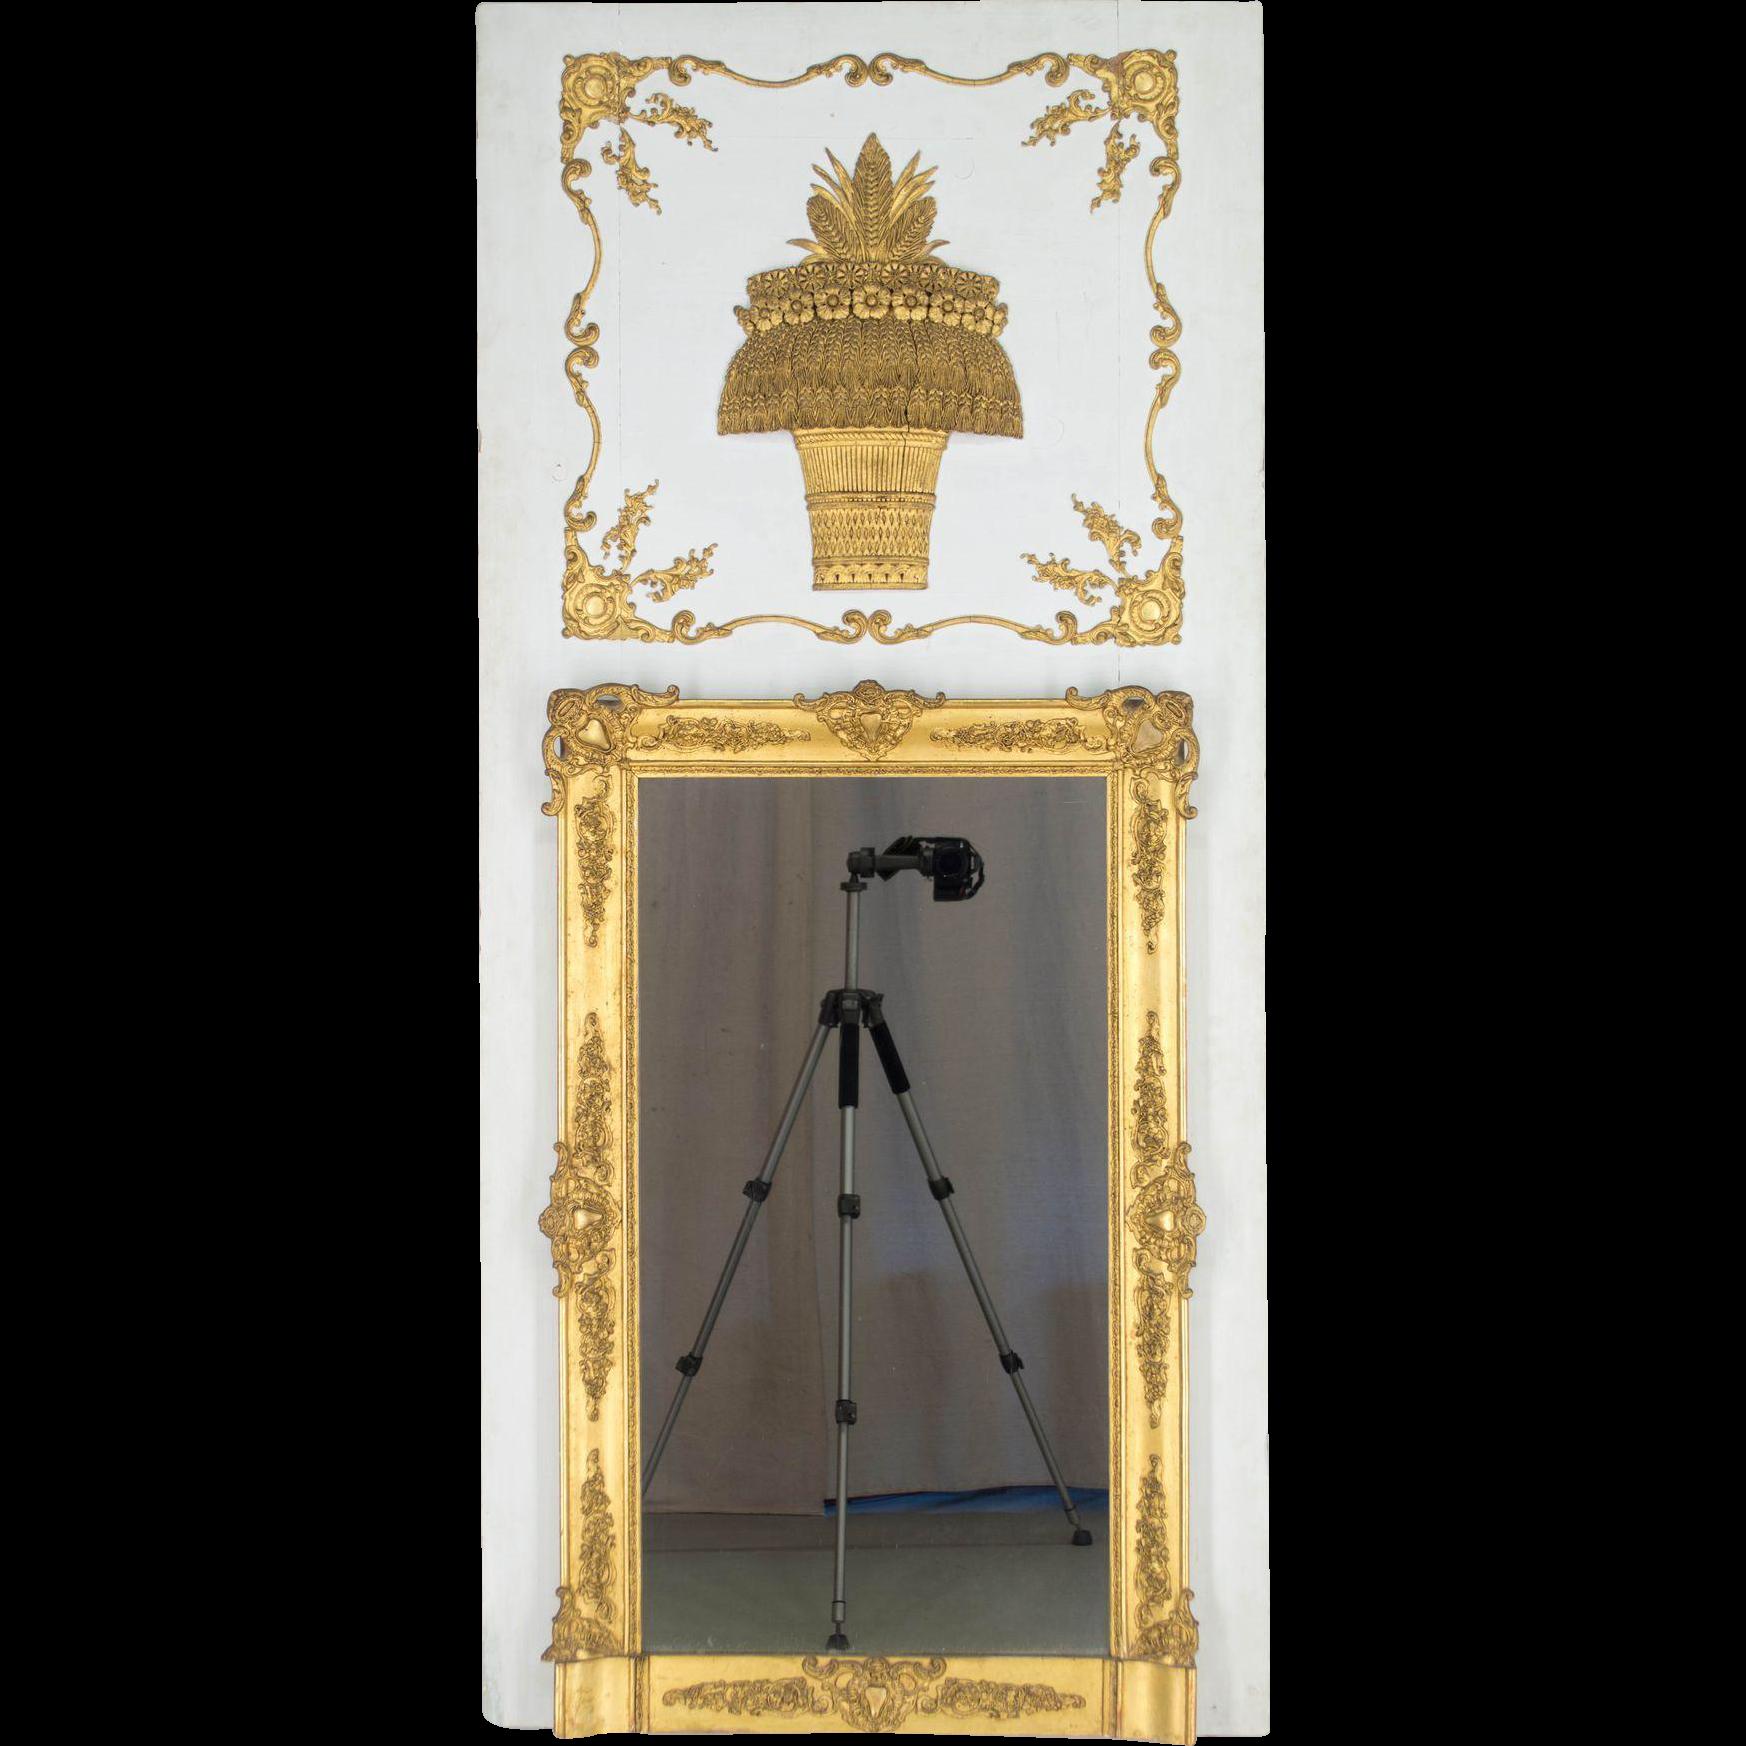 Period Directoire Trumeau or Mirror